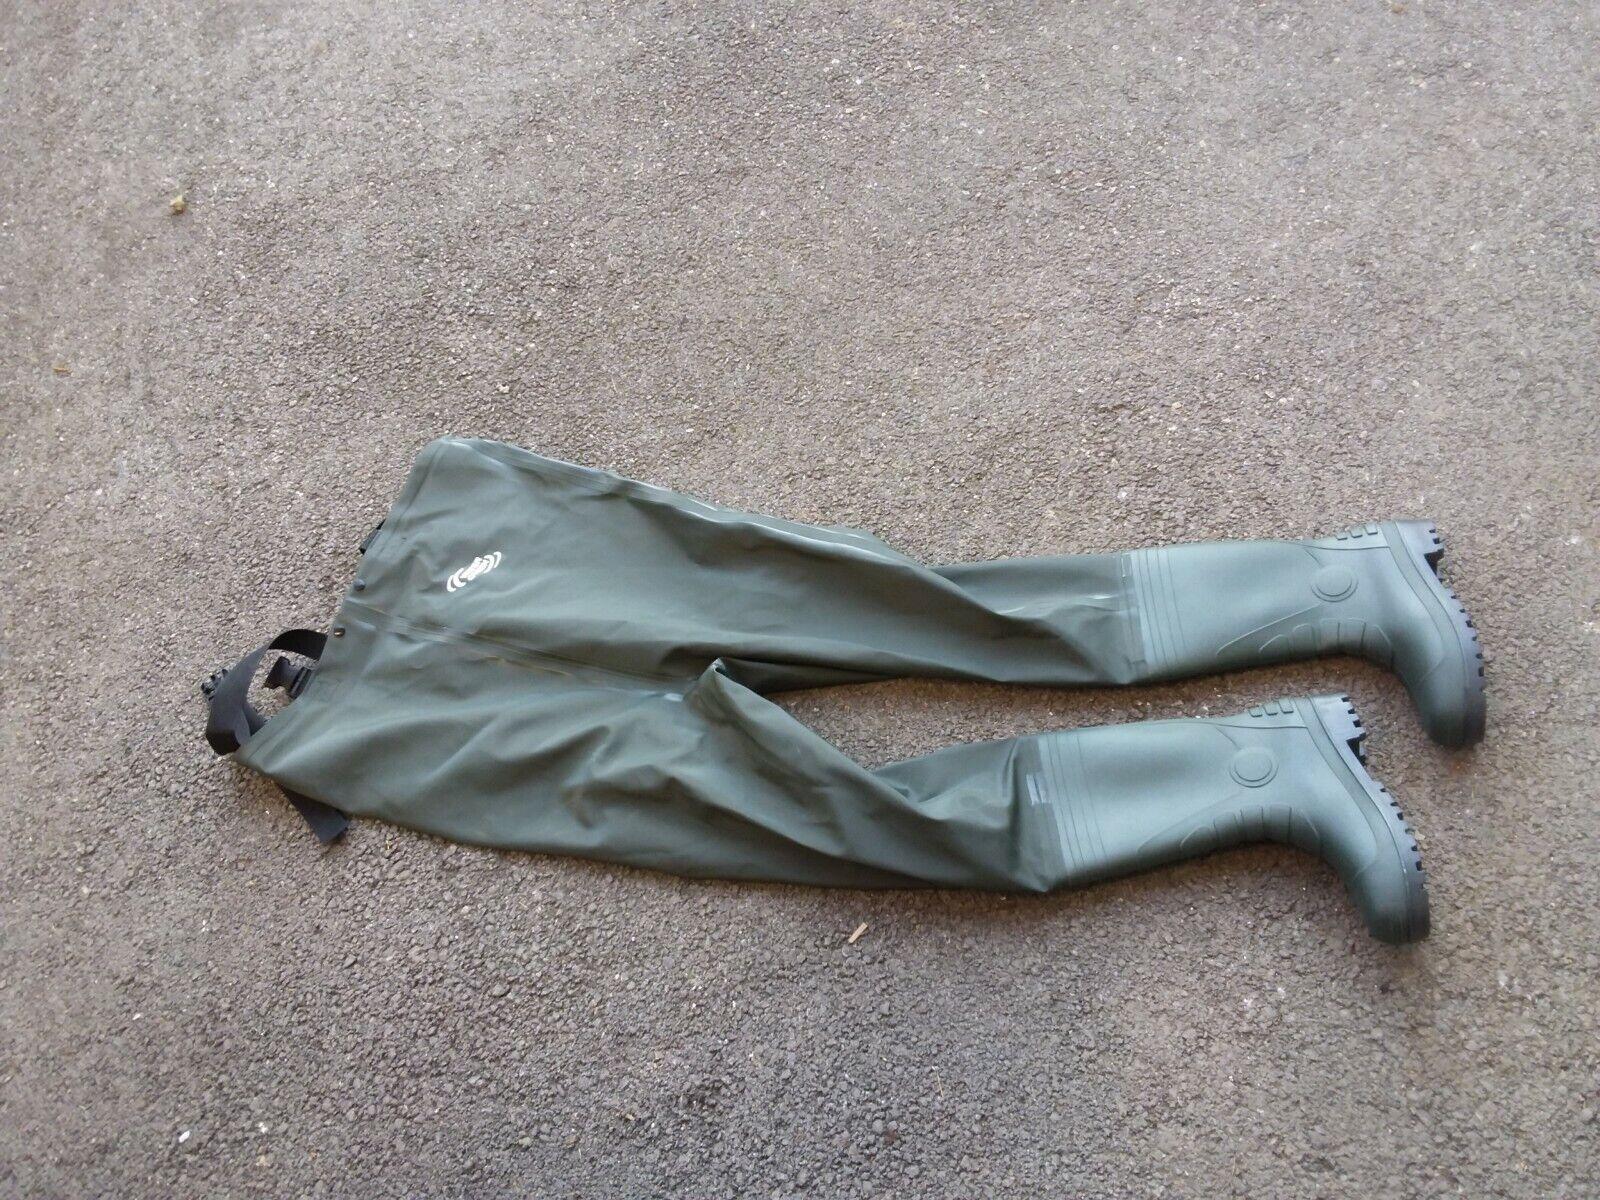 Wader pantalon de peche pvc water queen botte neuf size 38